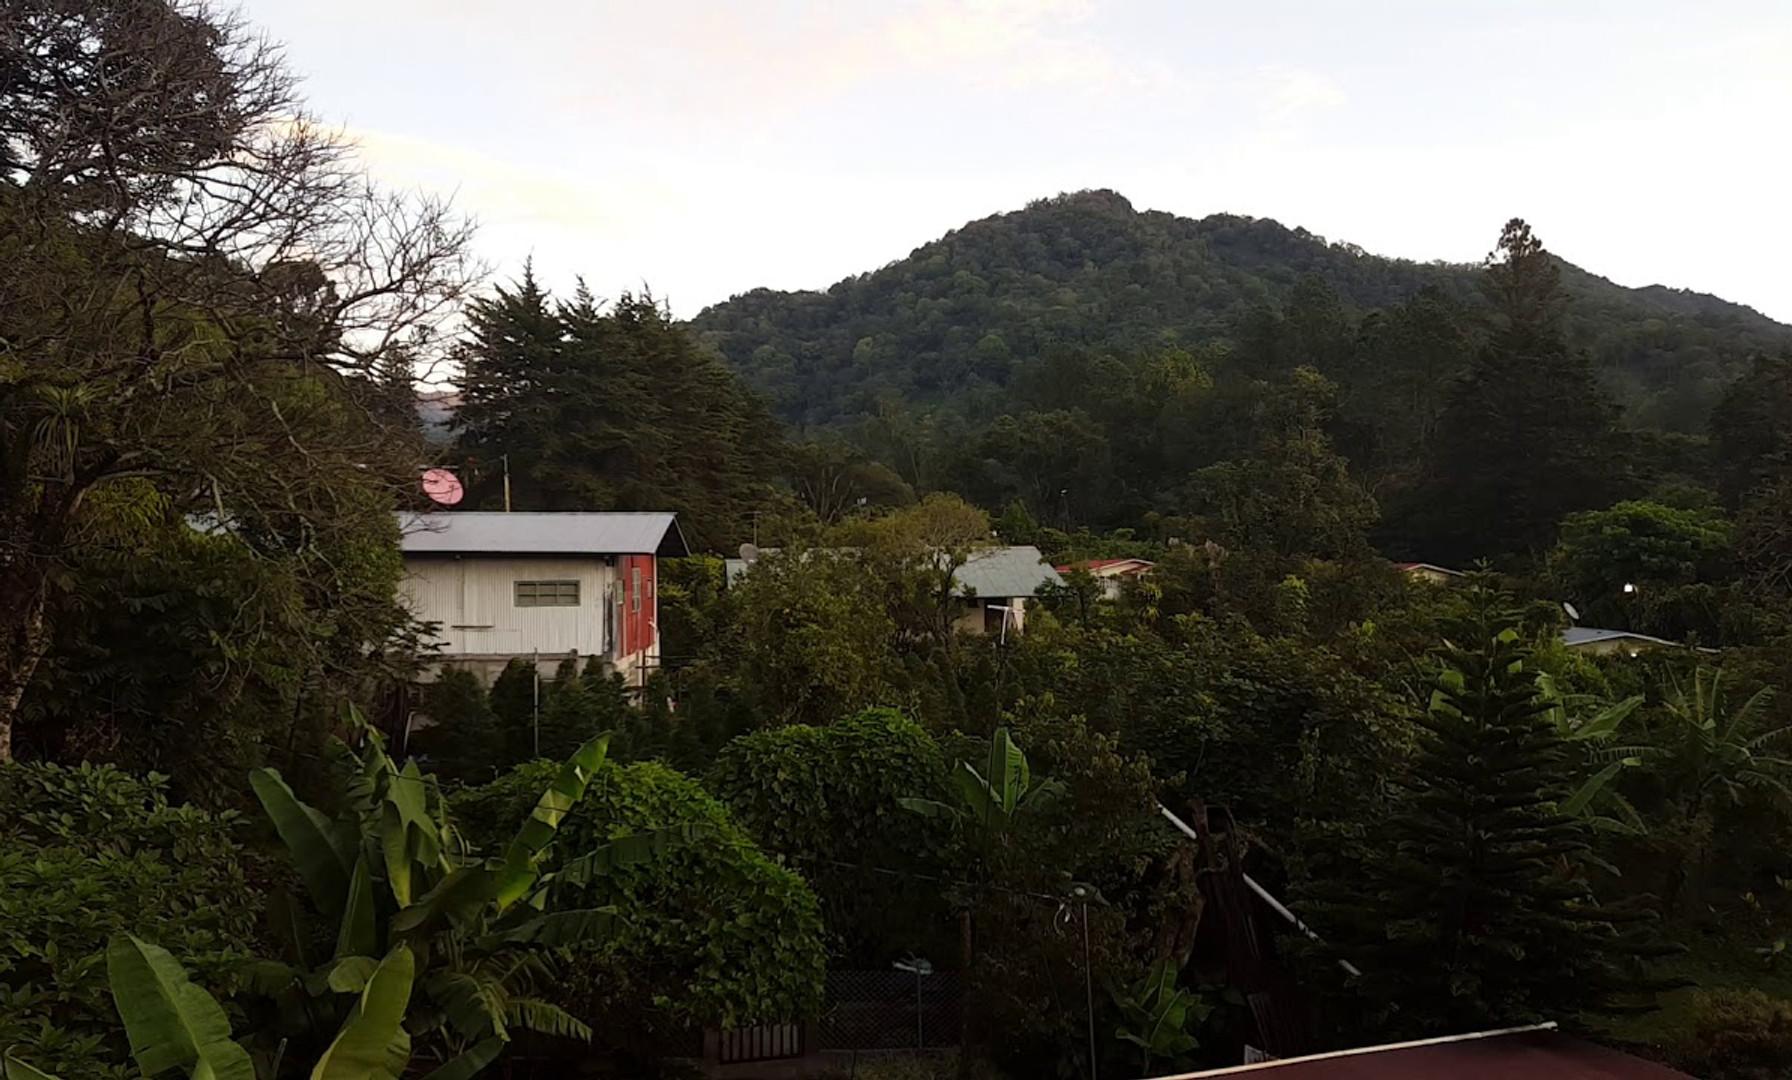 Mountain Sounds at Boquete, Panama